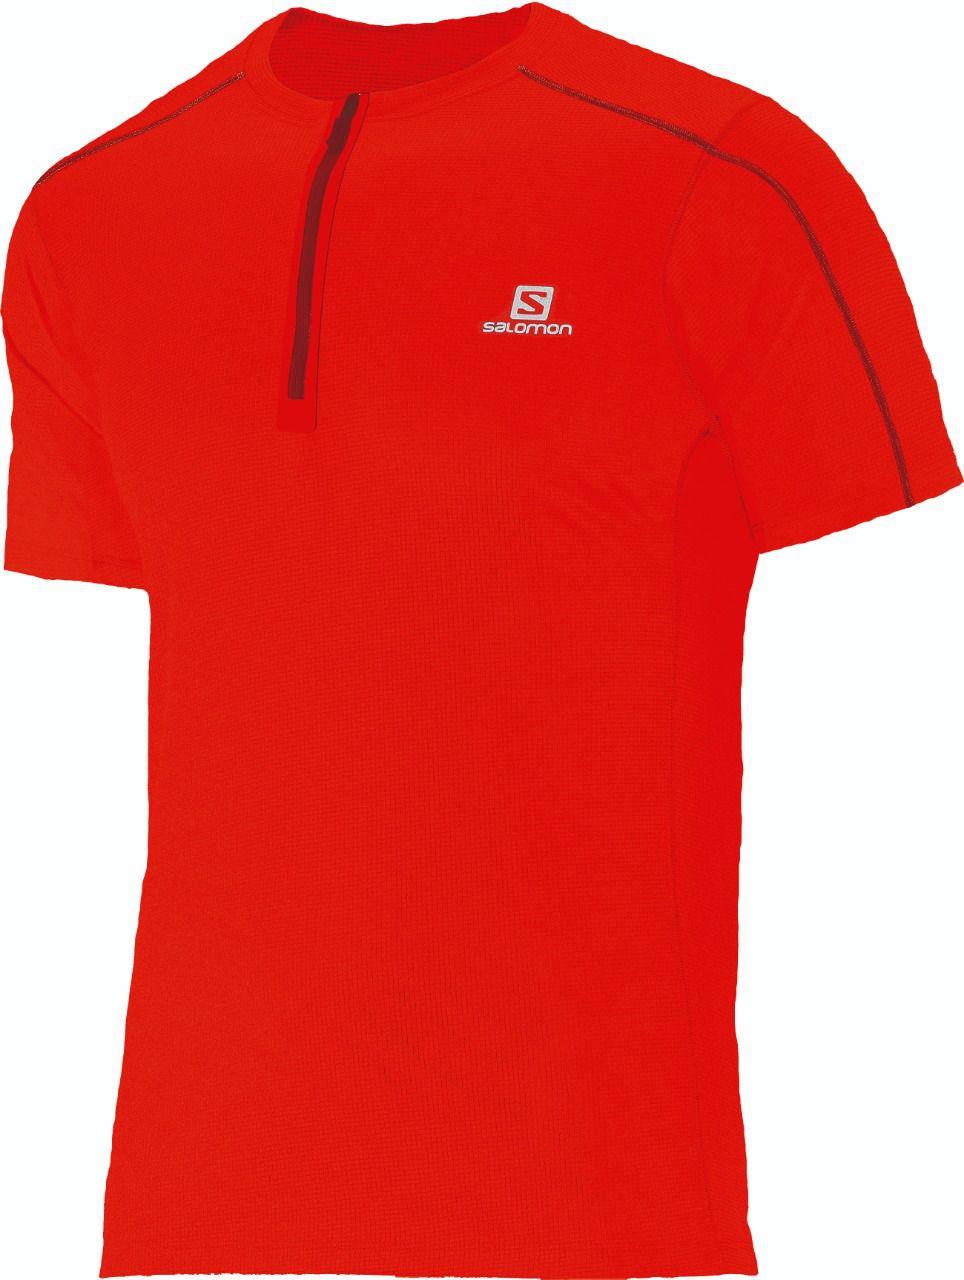 Camiseta Trail Running Action 1/2 Zip Salomon